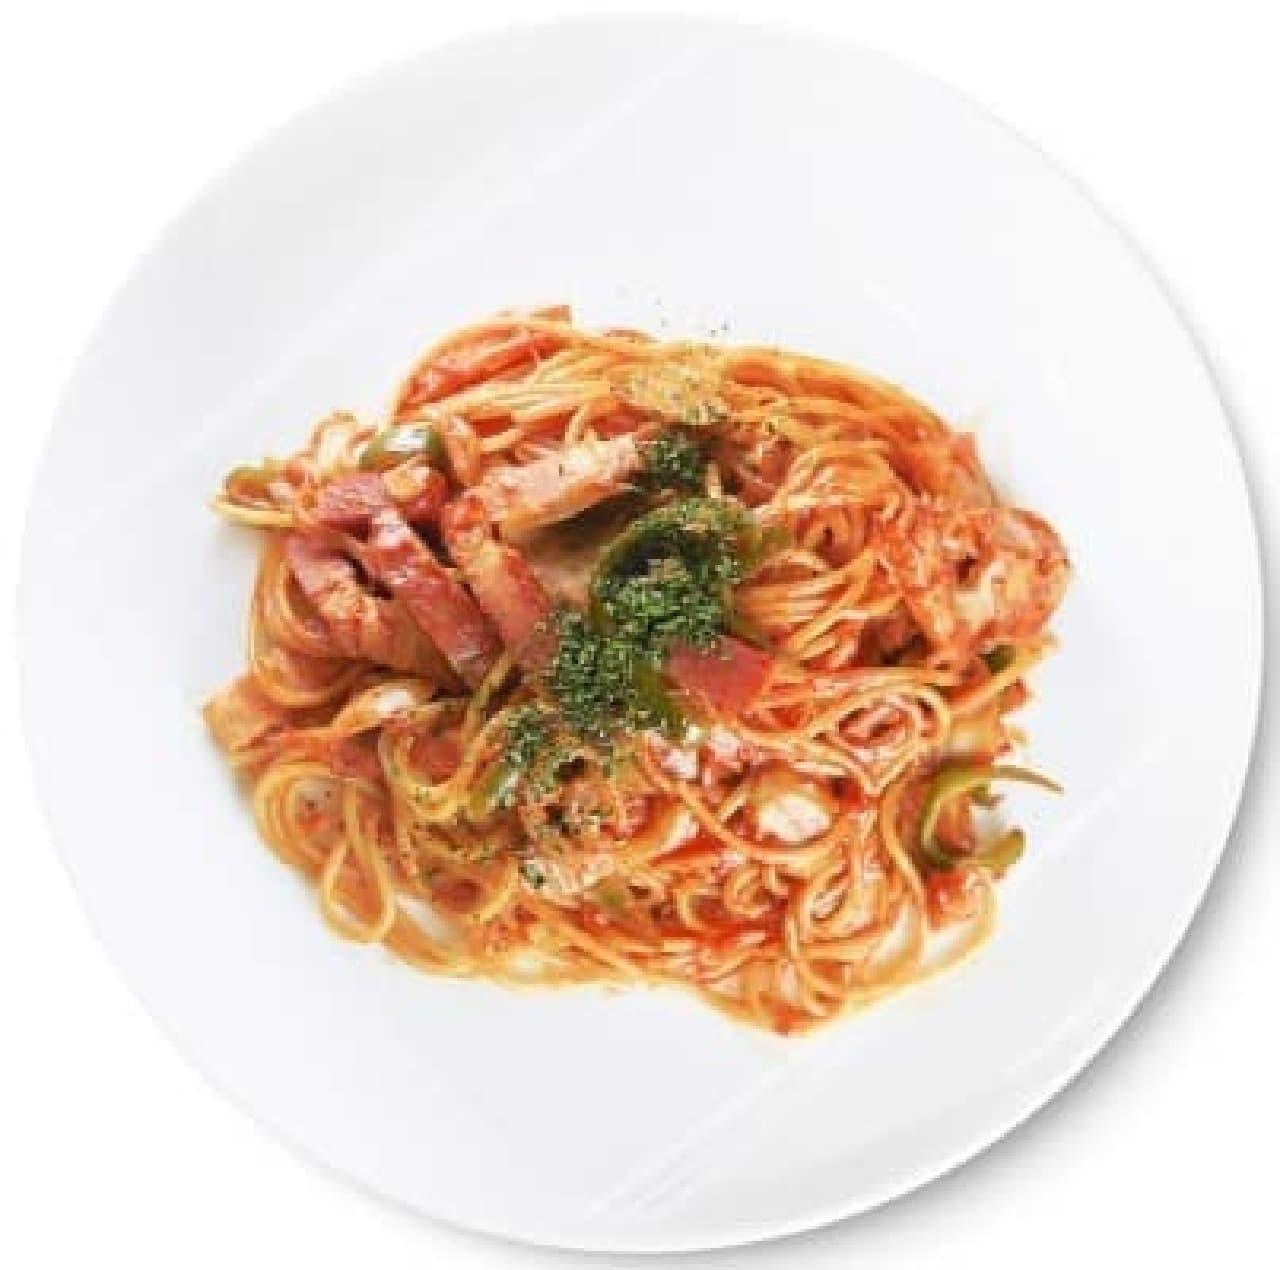 9.Pasta House 都筑亭(神奈川県)「横浜ナポリタン」